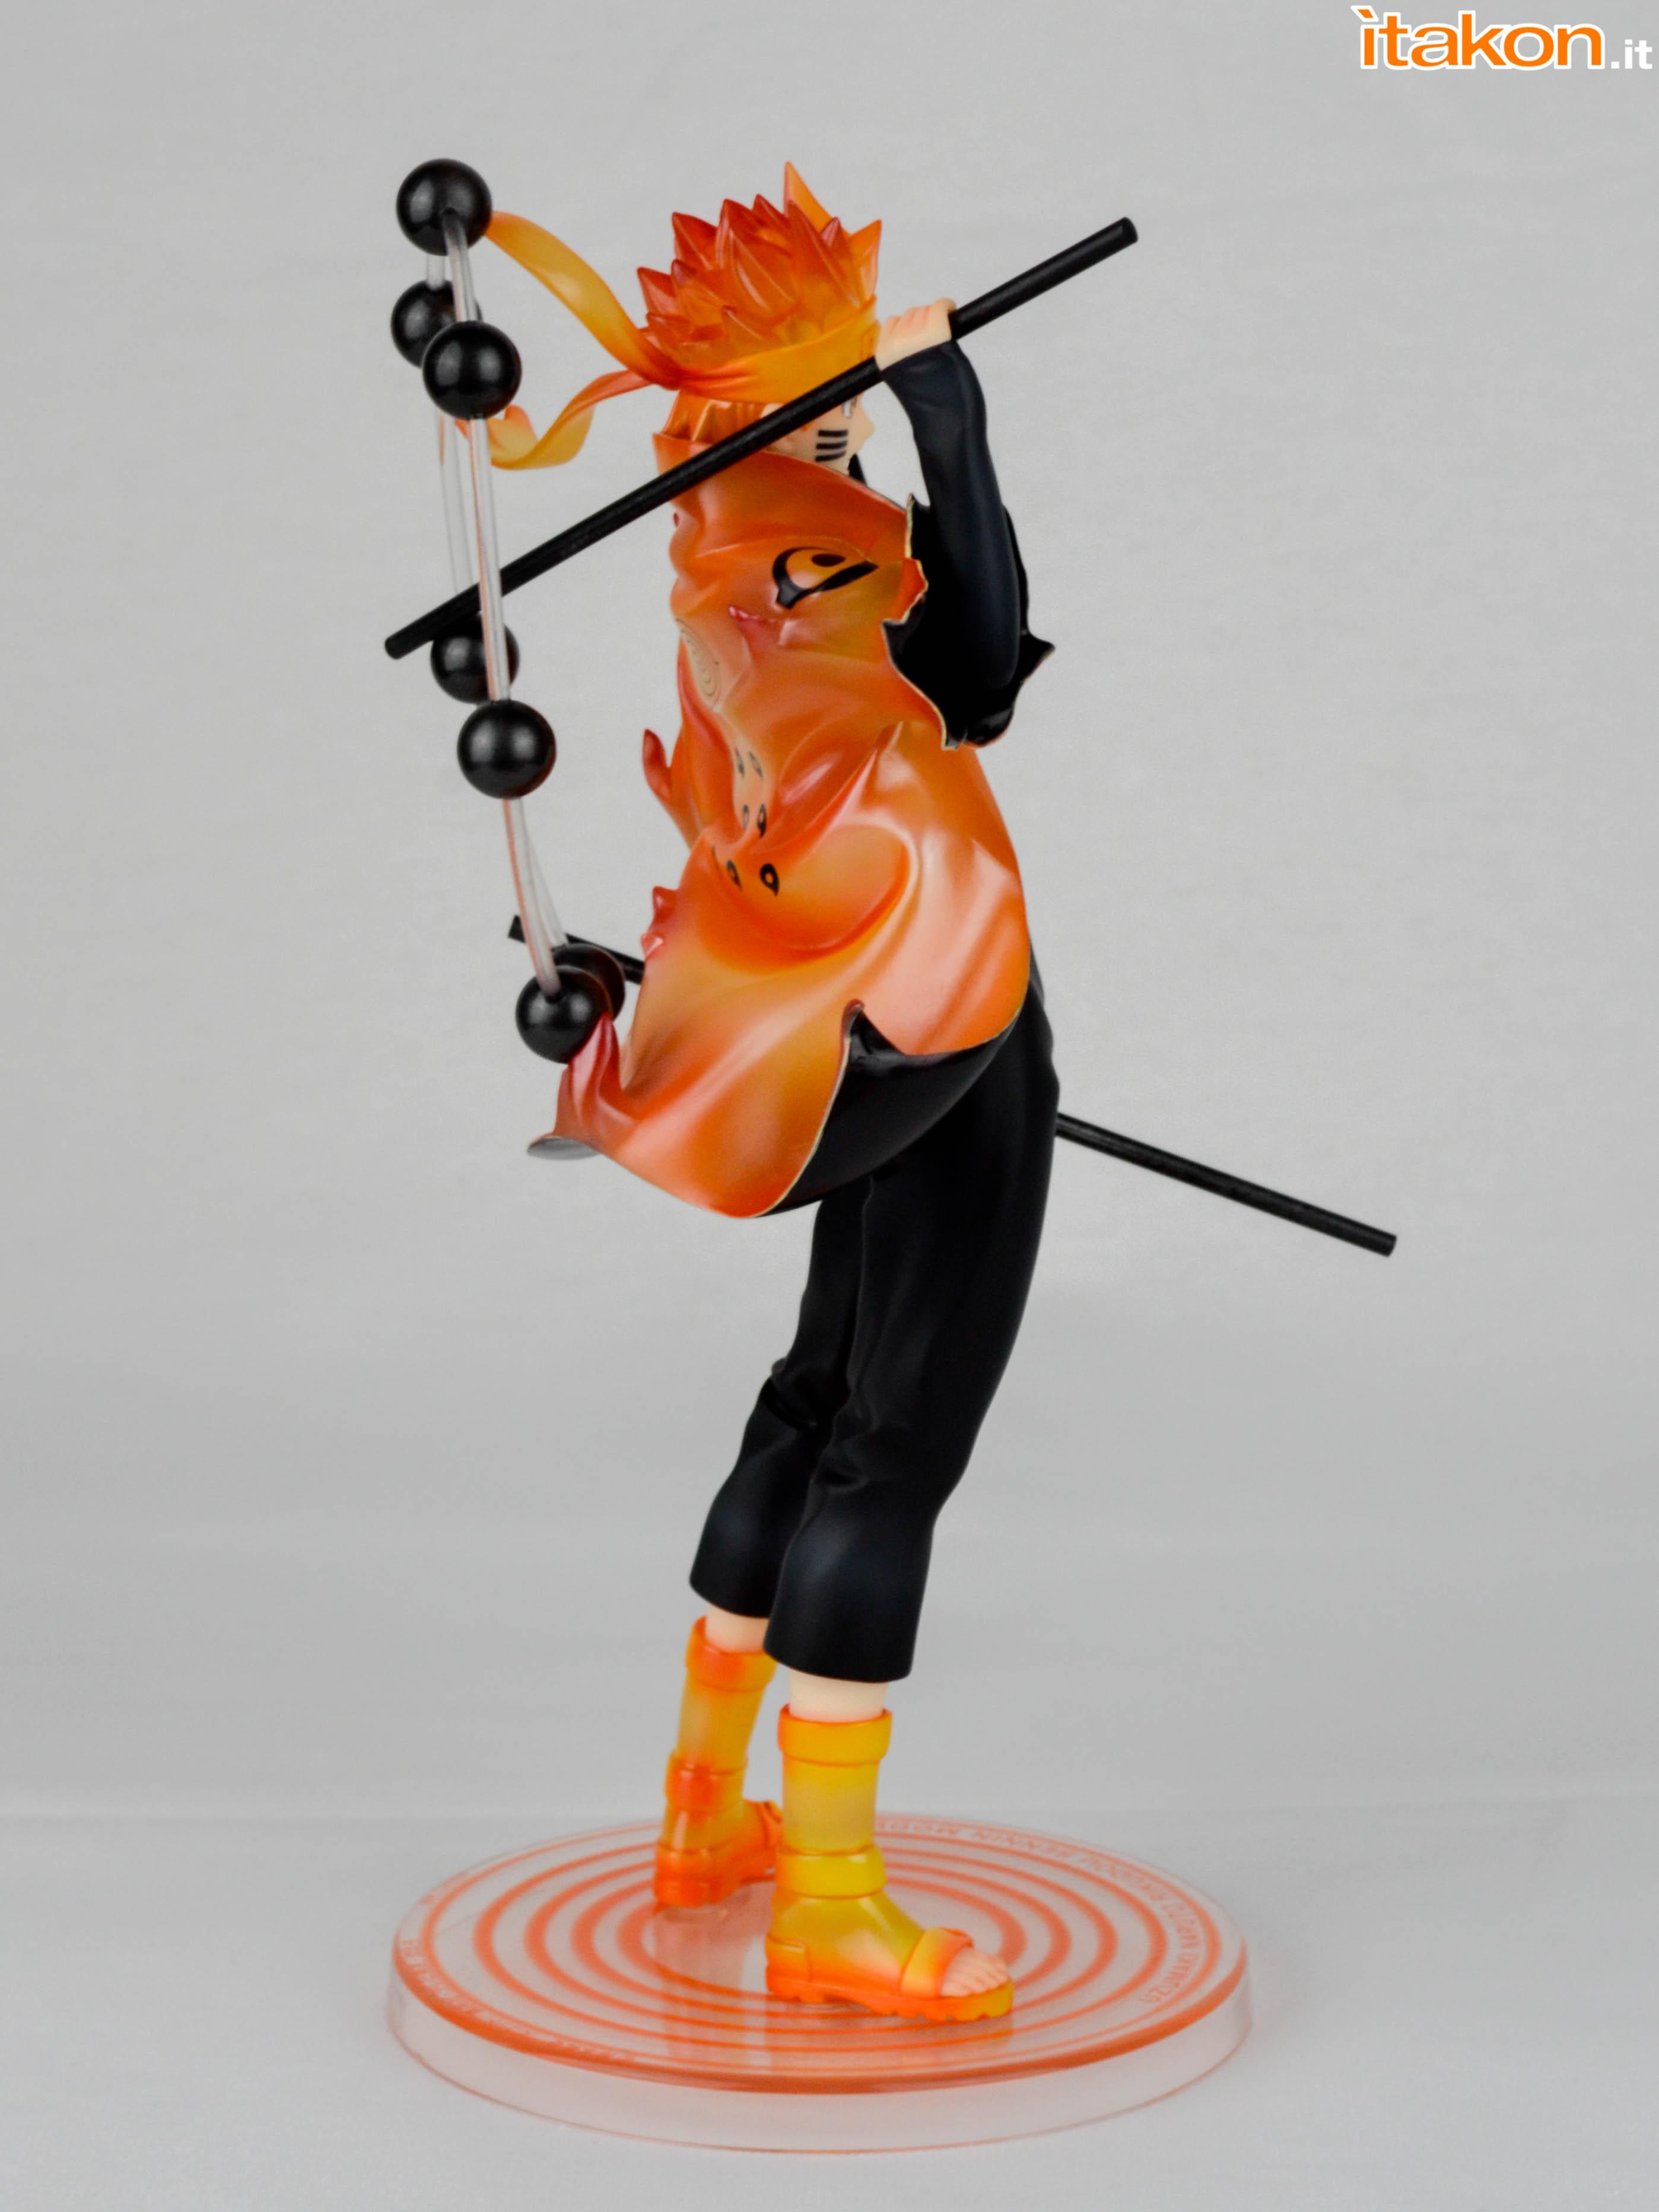 Naruto_Rikudou_Sennin_Mode_GEM_MegaHouse_Review-360 (7)